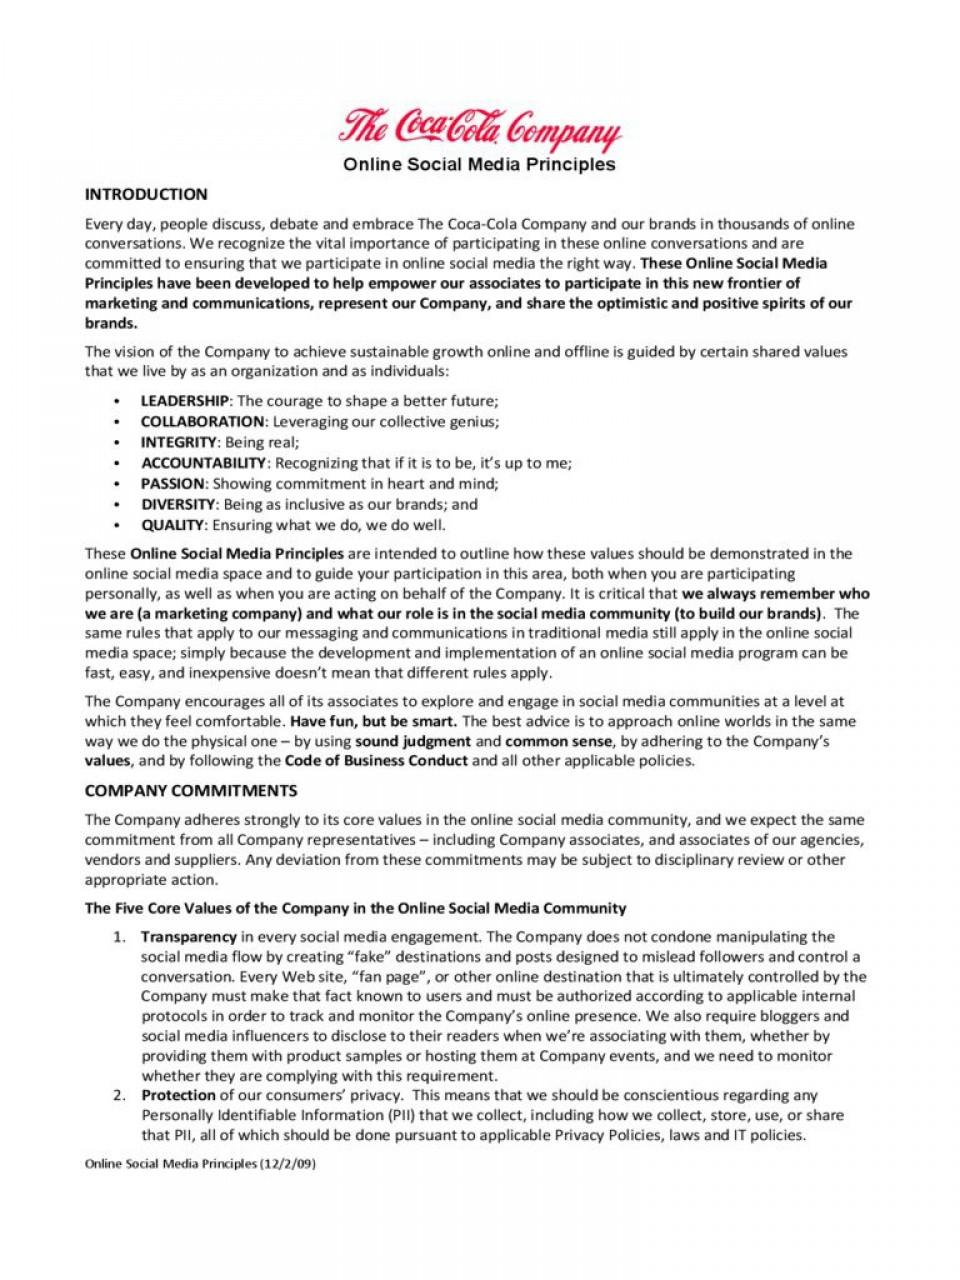 001 Sensational Social Media Policy Template Example  2020 Australia Nonprofit960